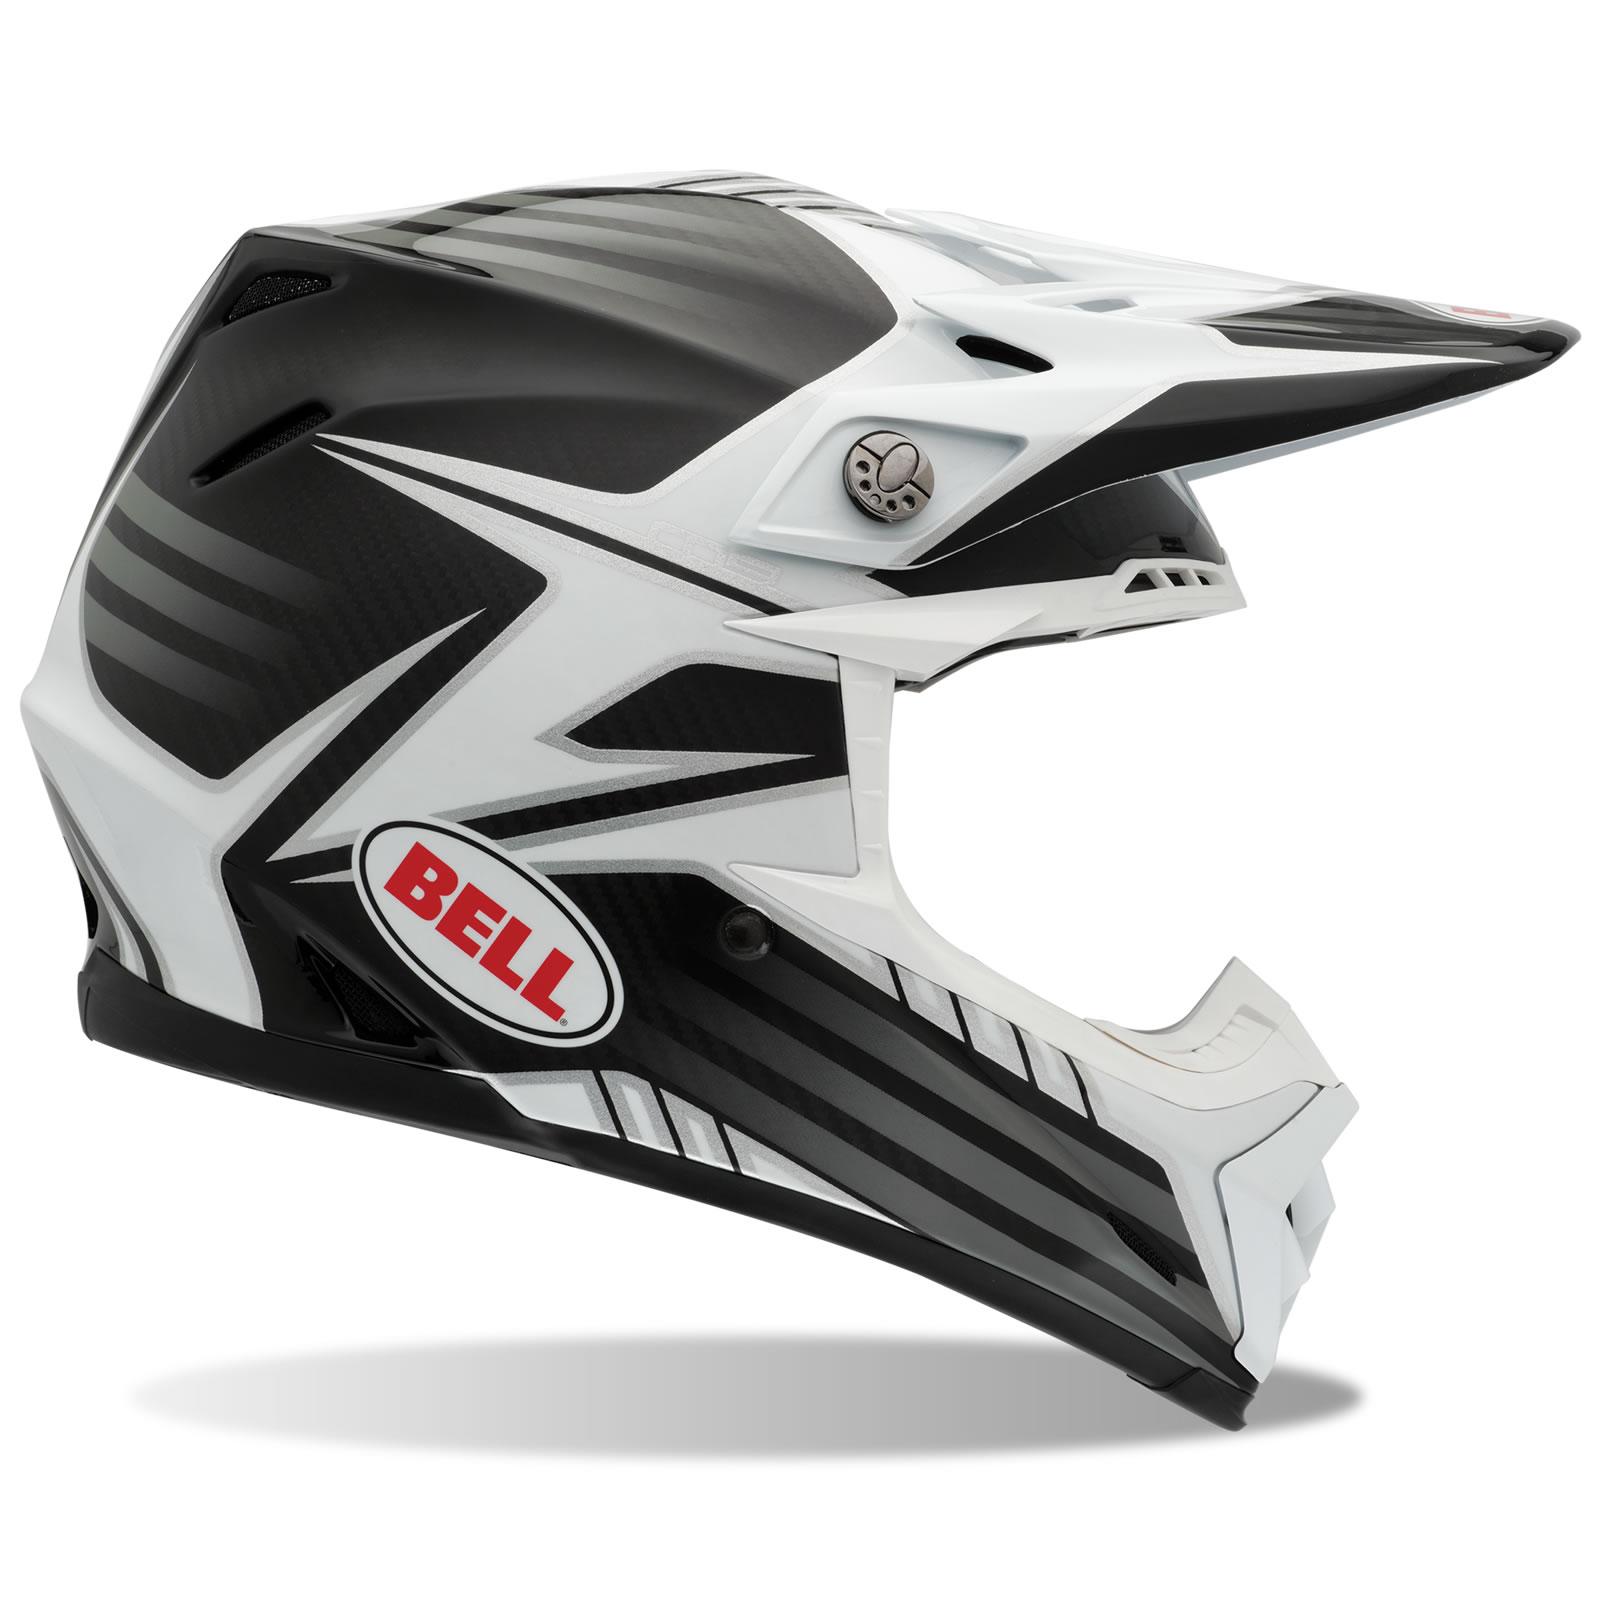 bell moto 9 carbon fibre pinned white black motocross helmet quad mx off road ebay. Black Bedroom Furniture Sets. Home Design Ideas